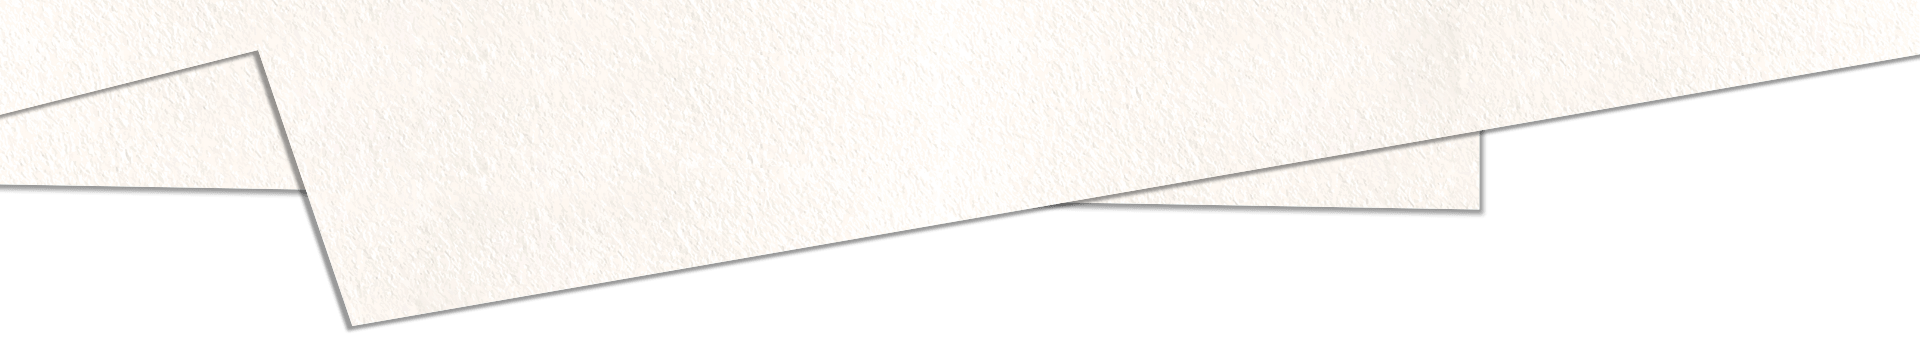 Divider-01-WHITE-min